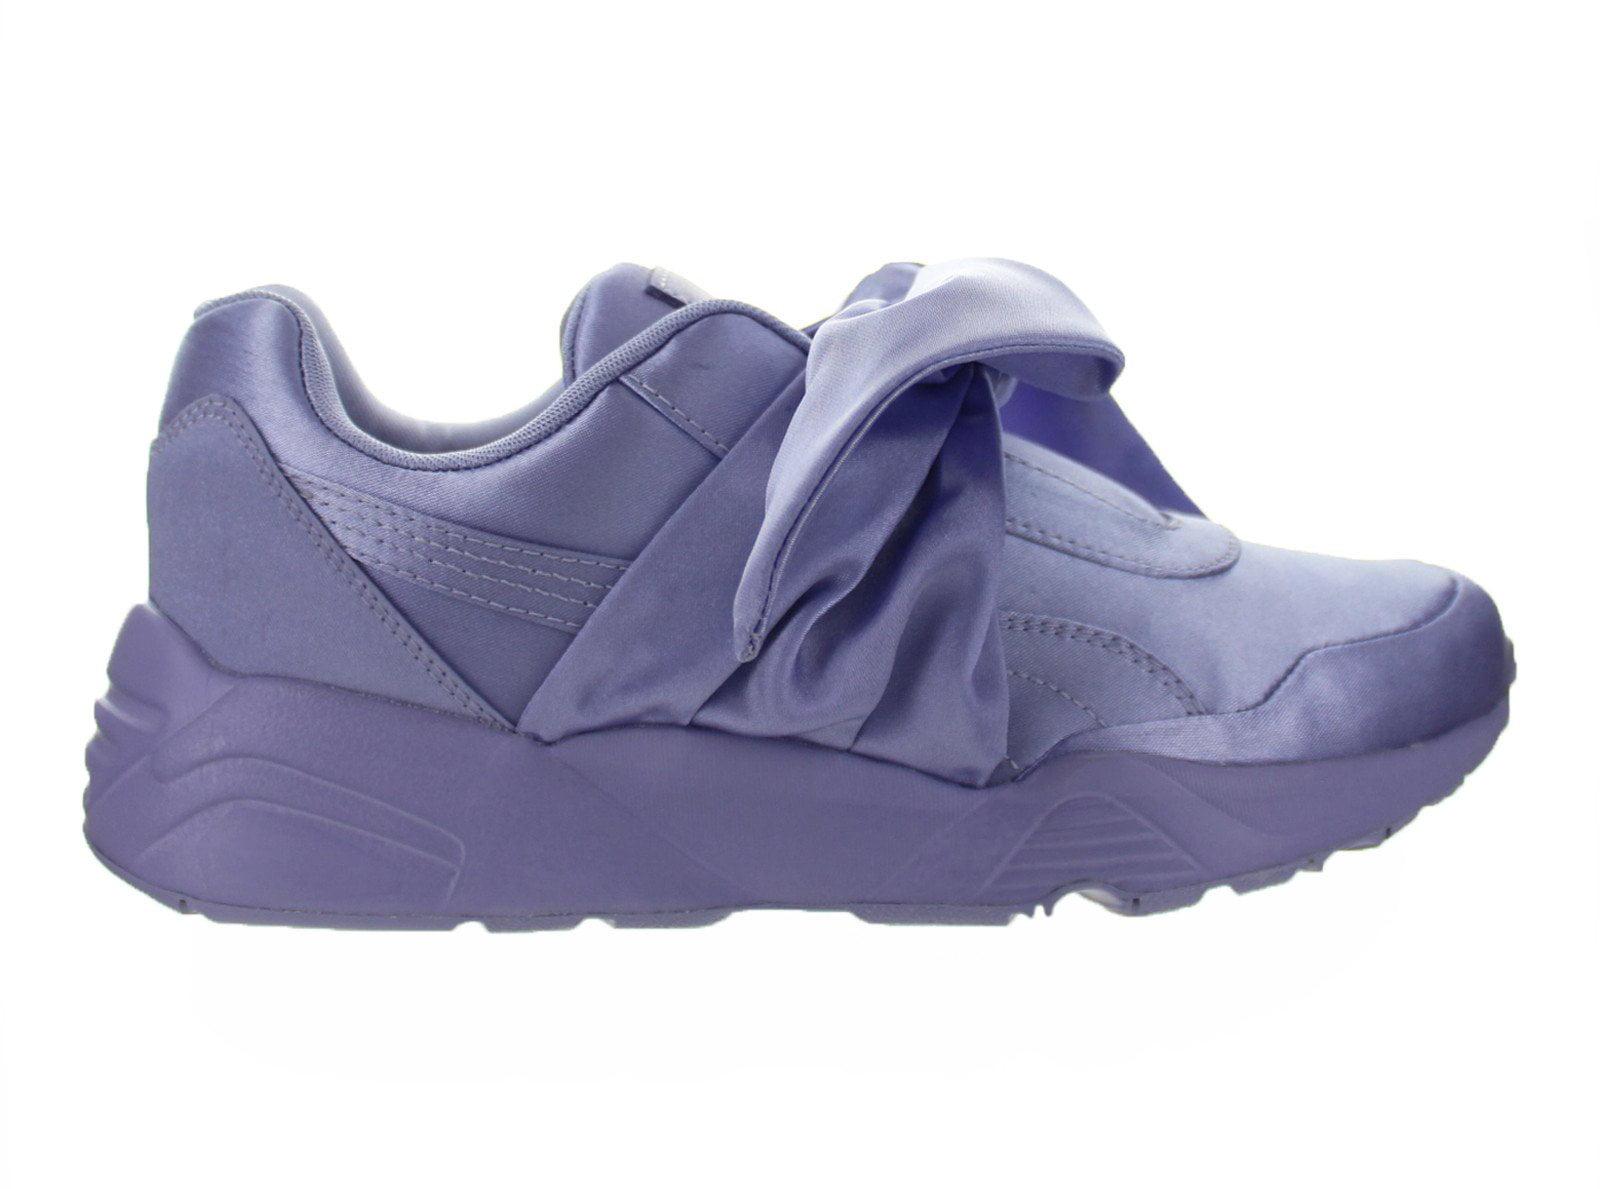 PUMA Womens Puma x Fenty By Rihanna Bow Sneaker Sweet Lavender Lilac Purple